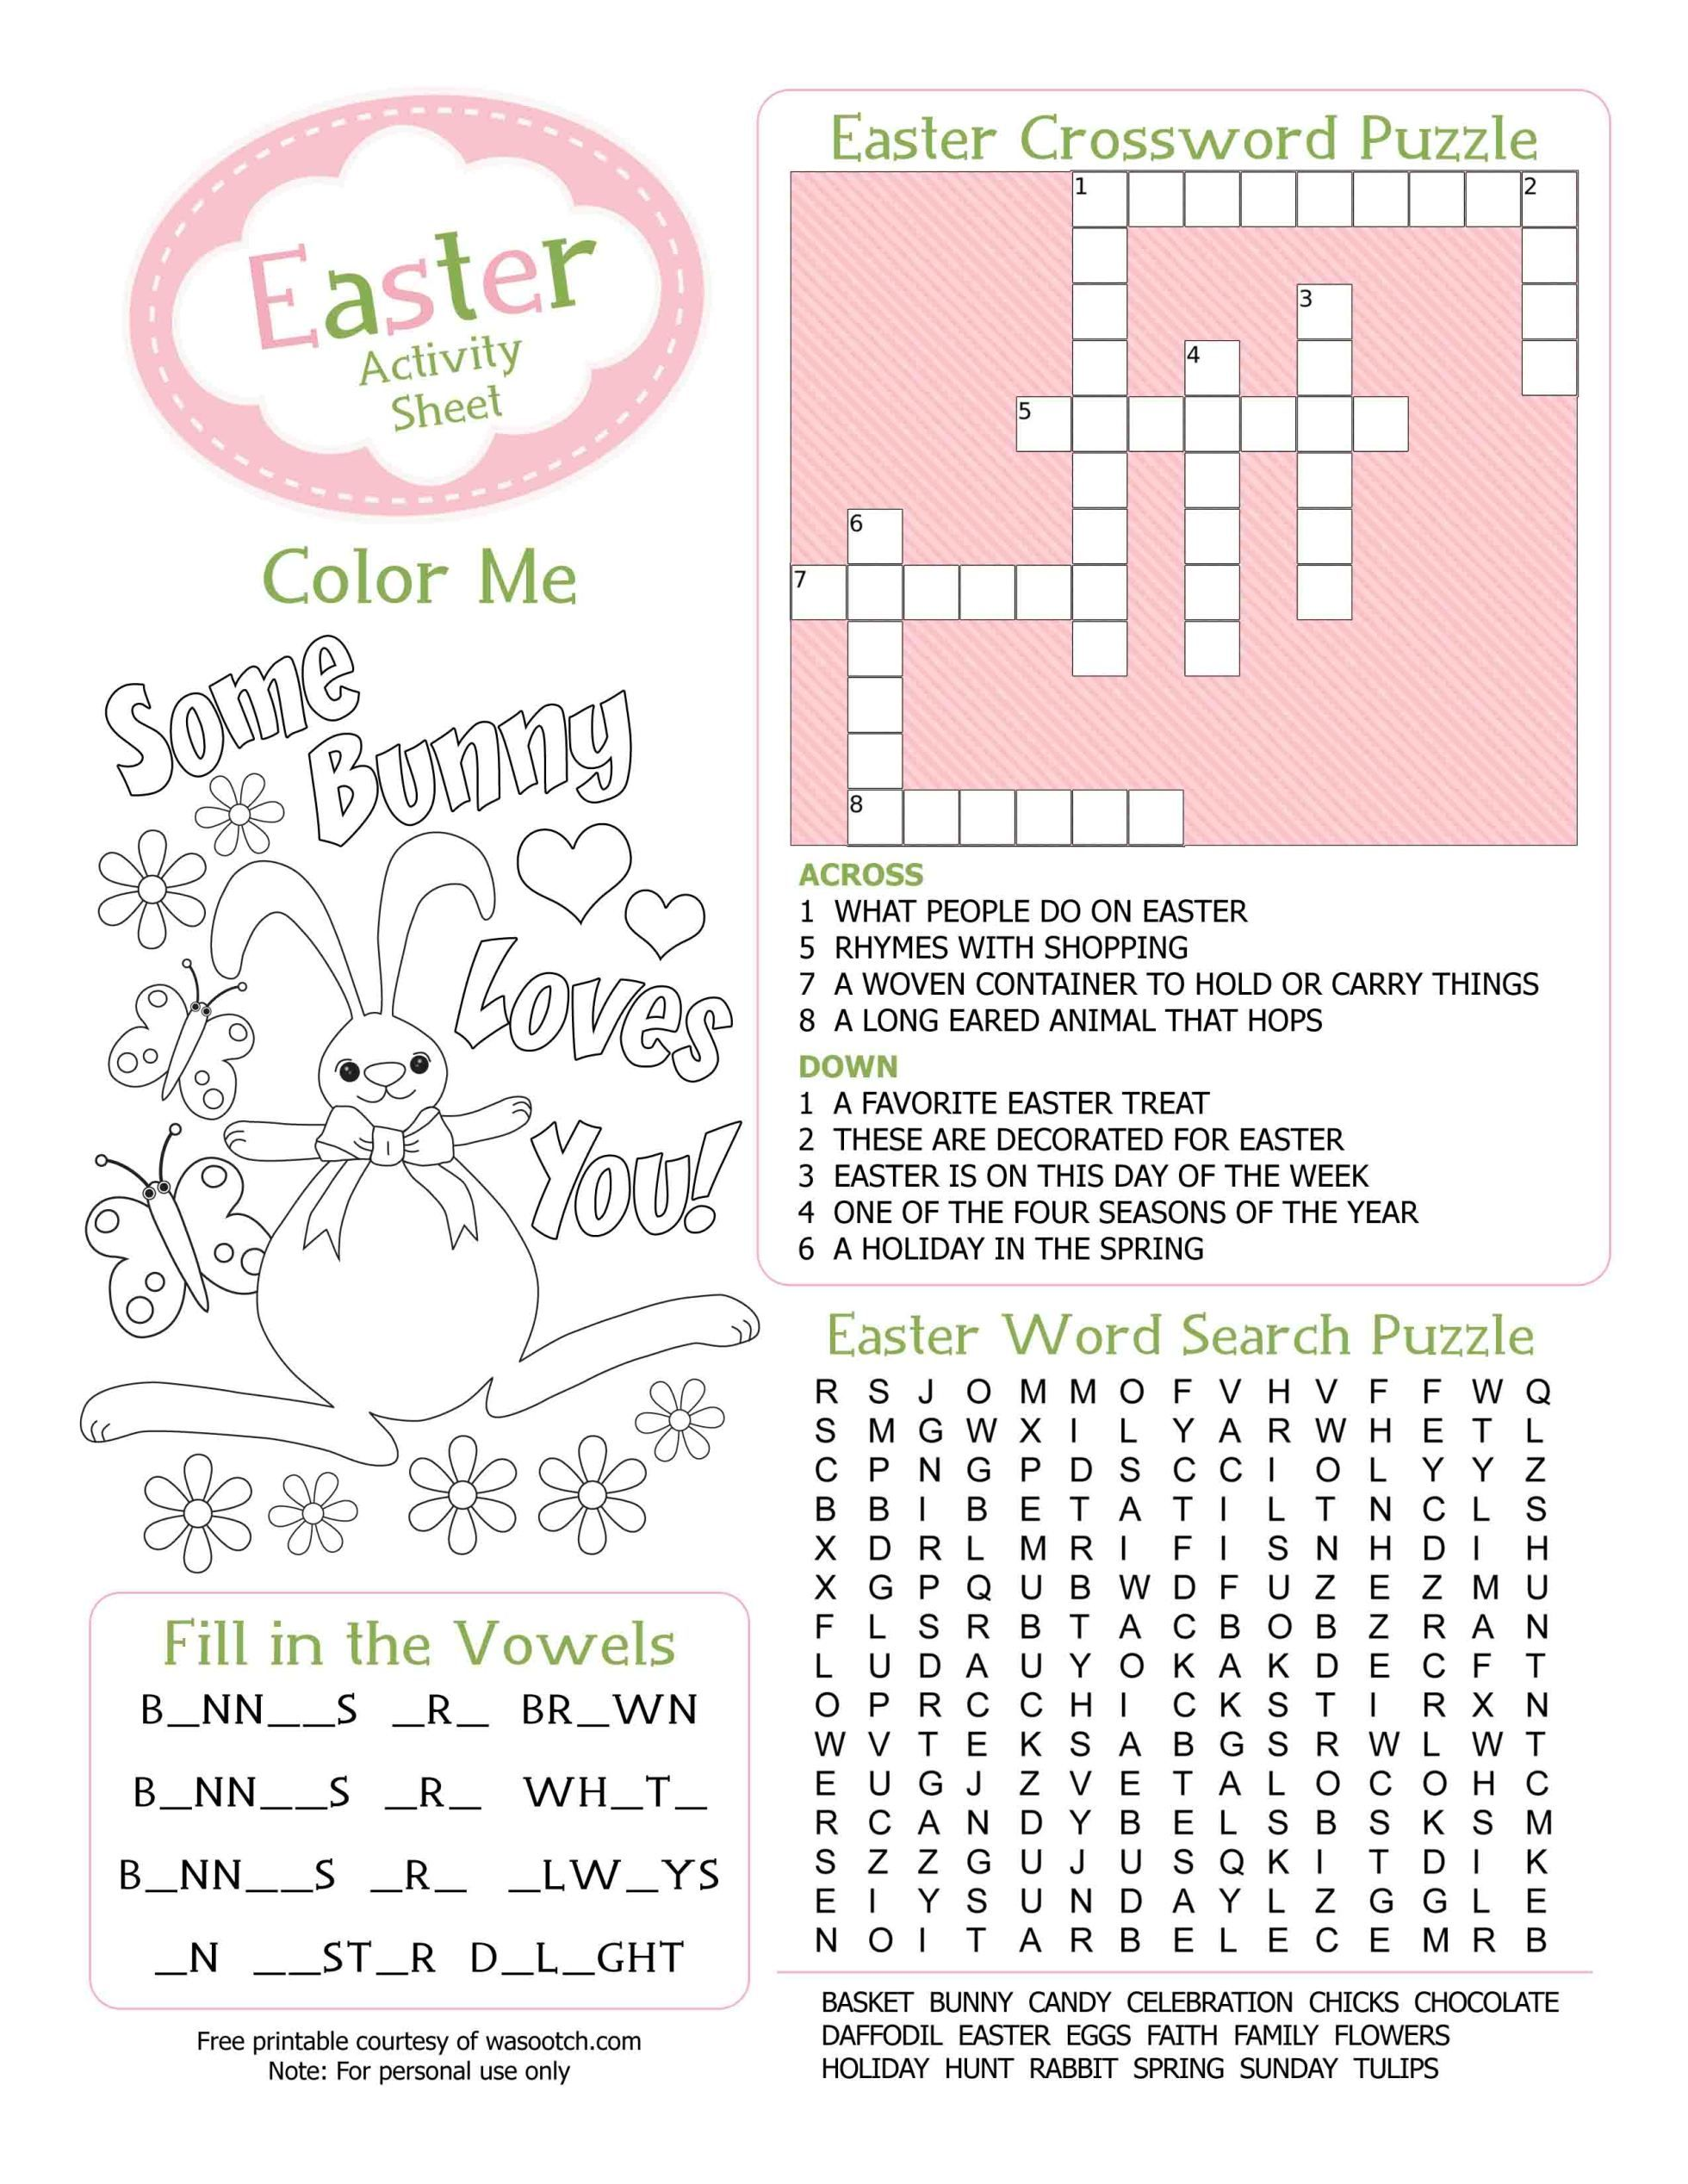 Easter Kid S Activity Sheet Free Printable Easter Printables Kids Easter Printables Free Easter Activities For Kids [ 2536 x 1960 Pixel ]